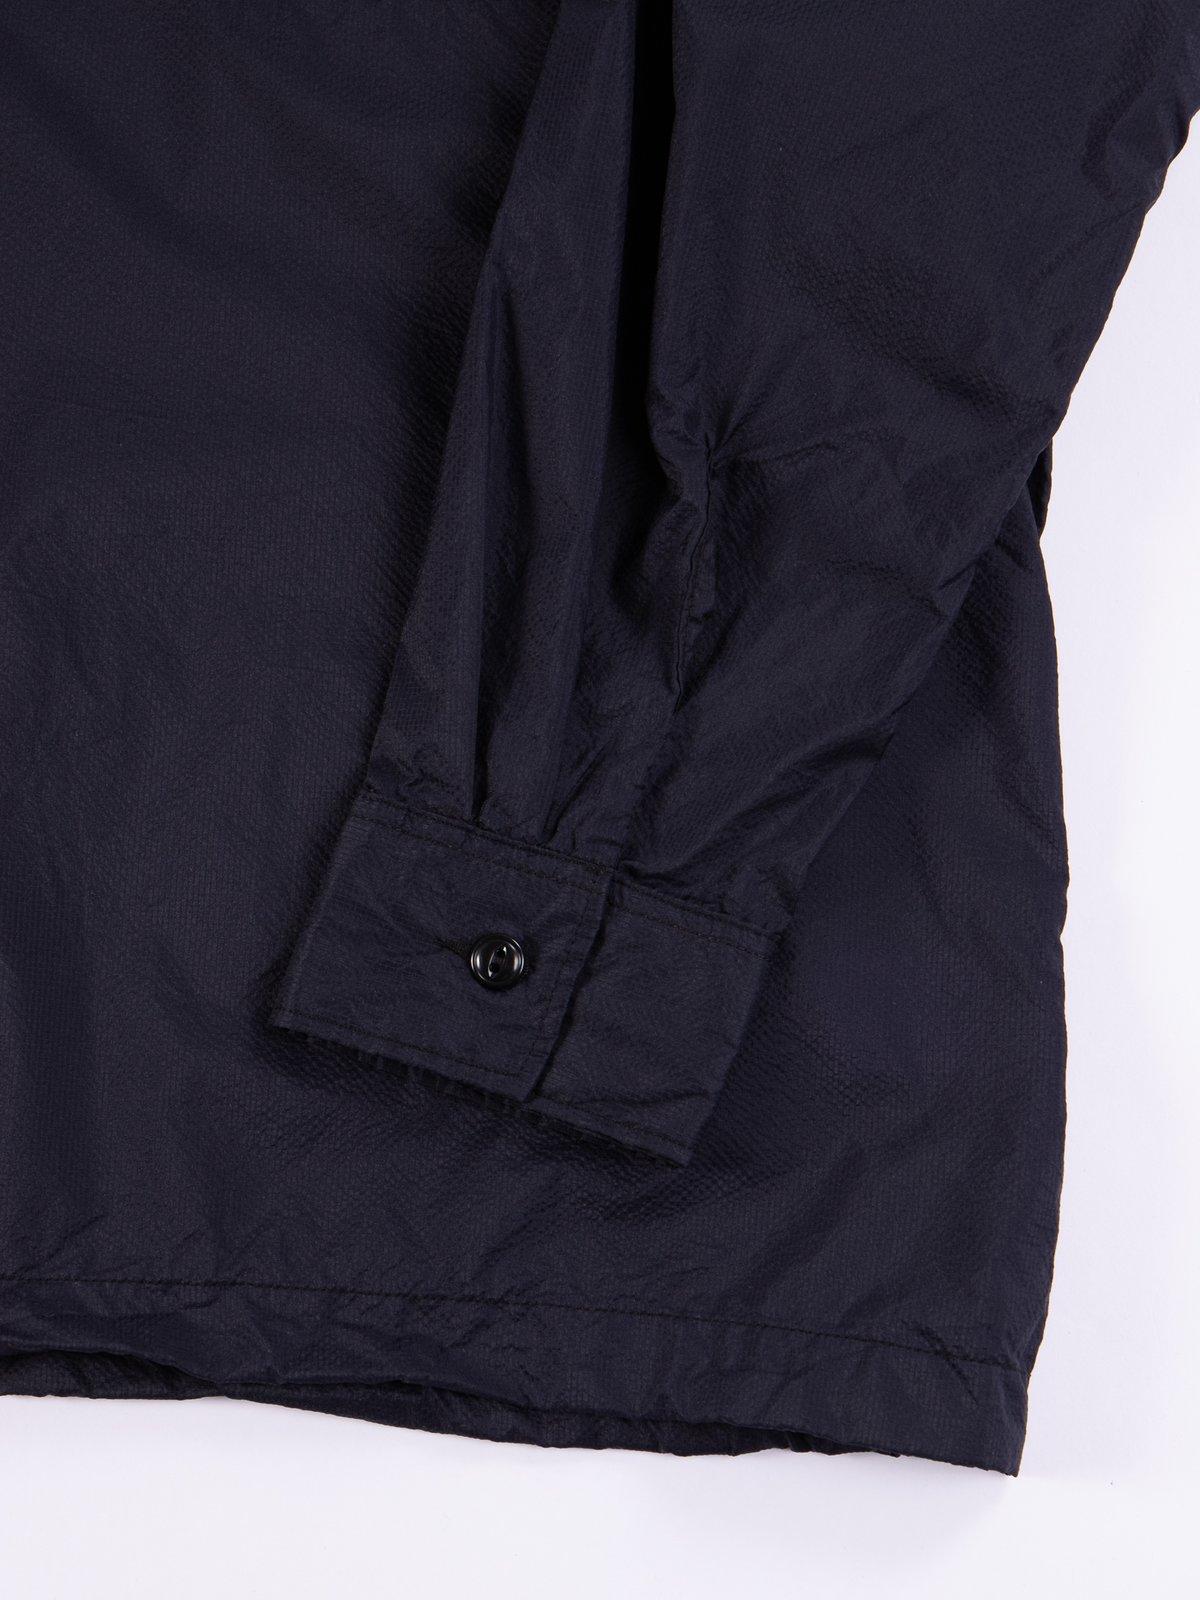 Dark Navy Nylon Micro Ripstop Cagoule Shirt - Image 5